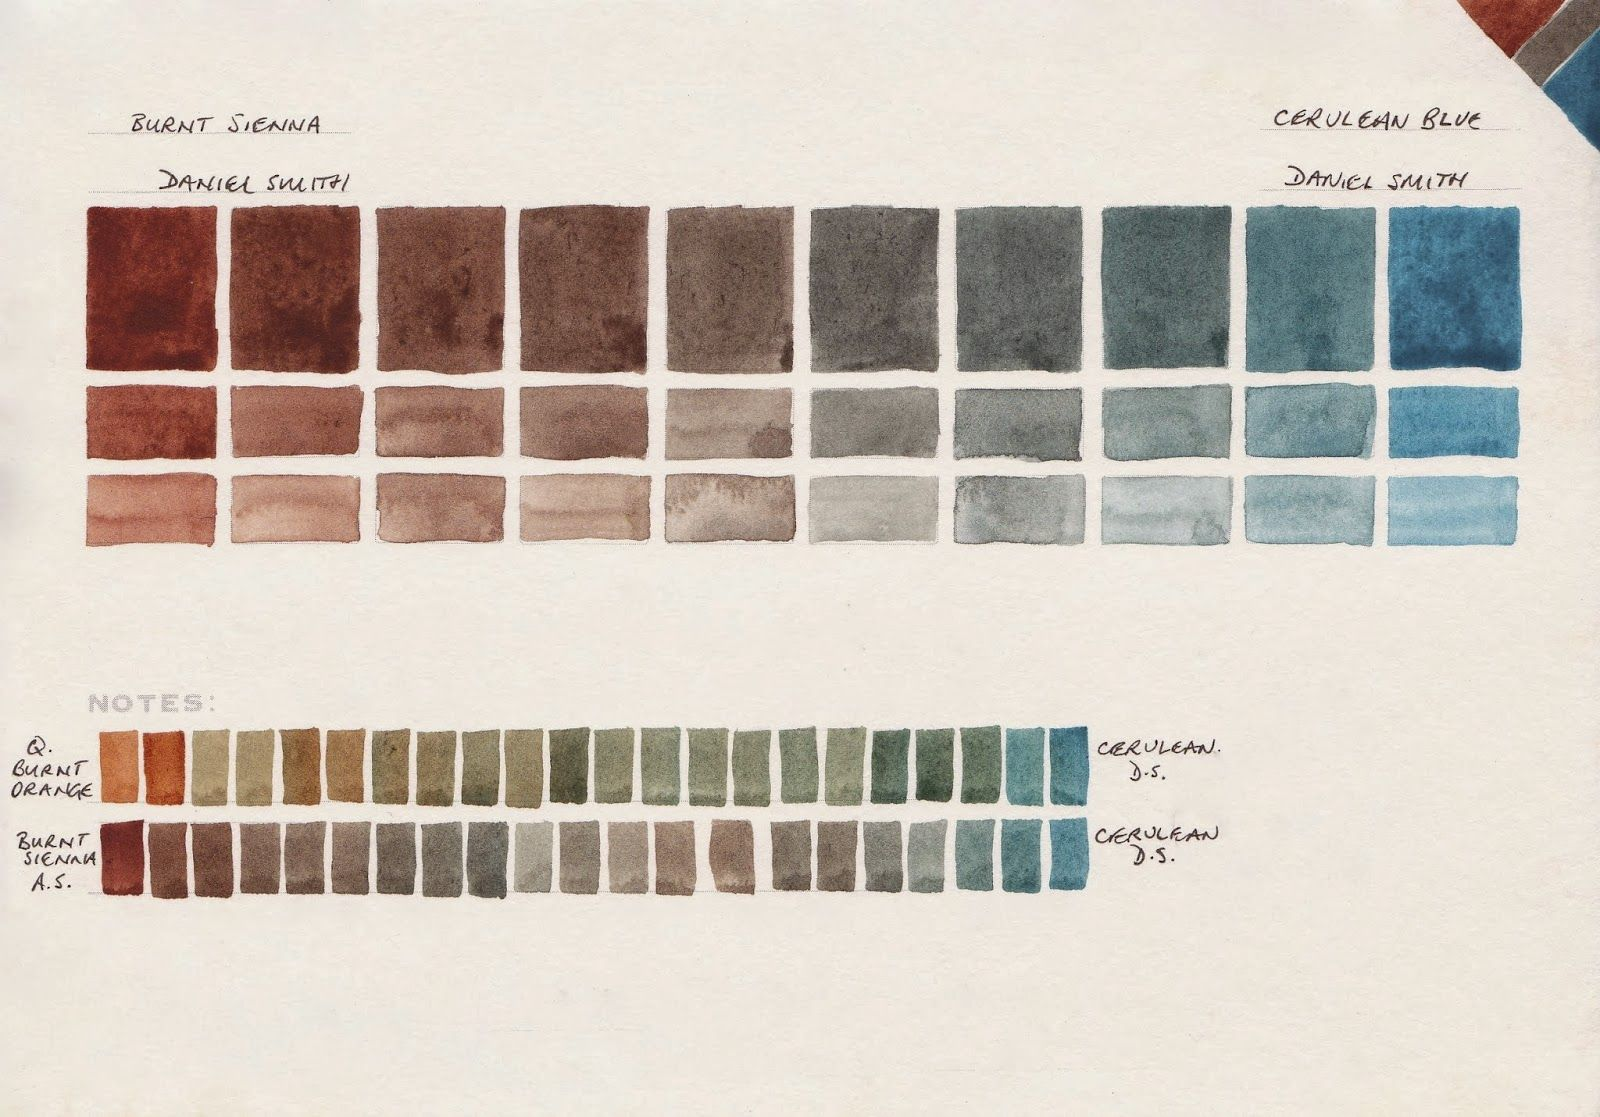 Jane Blundell: Watercolour Comparisons 4 - Burnt Sienna